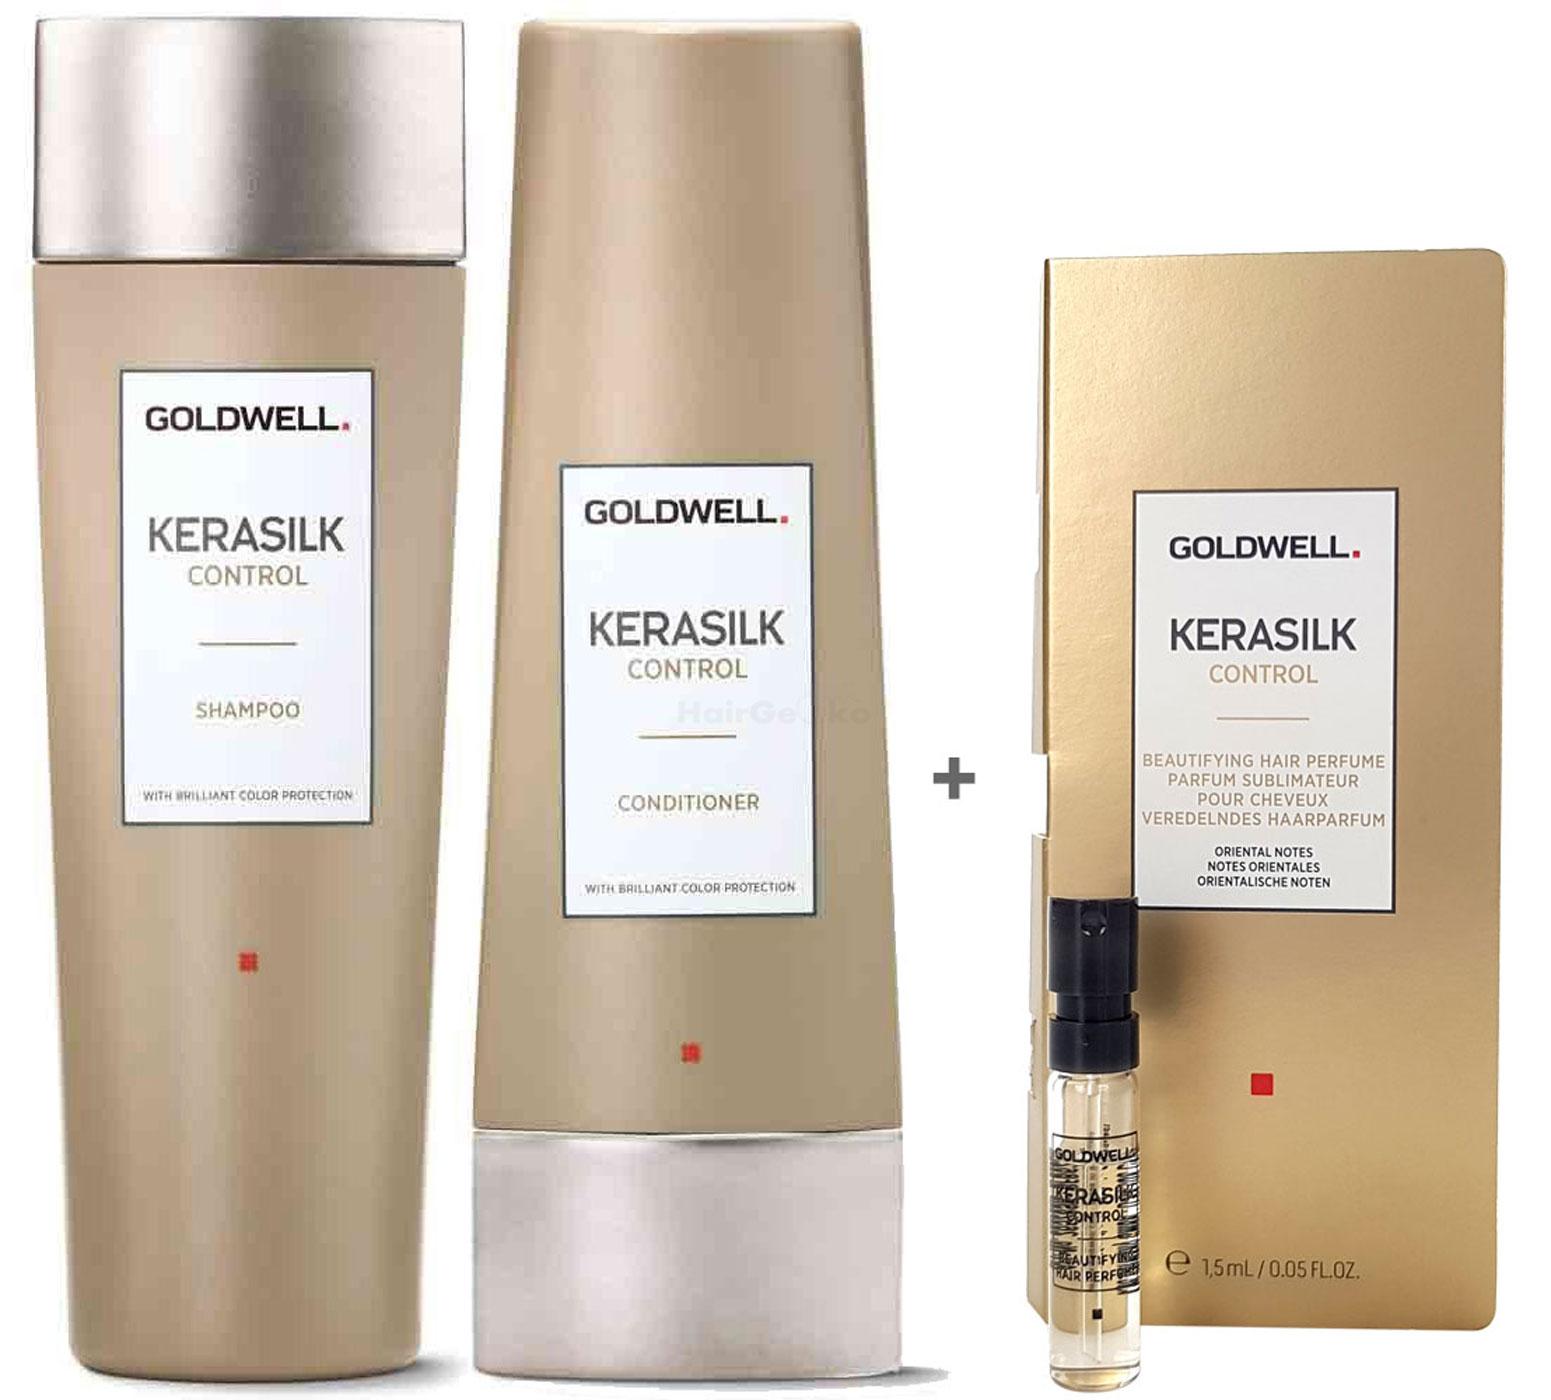 Goldwell Kerasilk Control Set - Shampoo 250ml + Conditioner 200ml + Haarparfum Probe 1,5ml